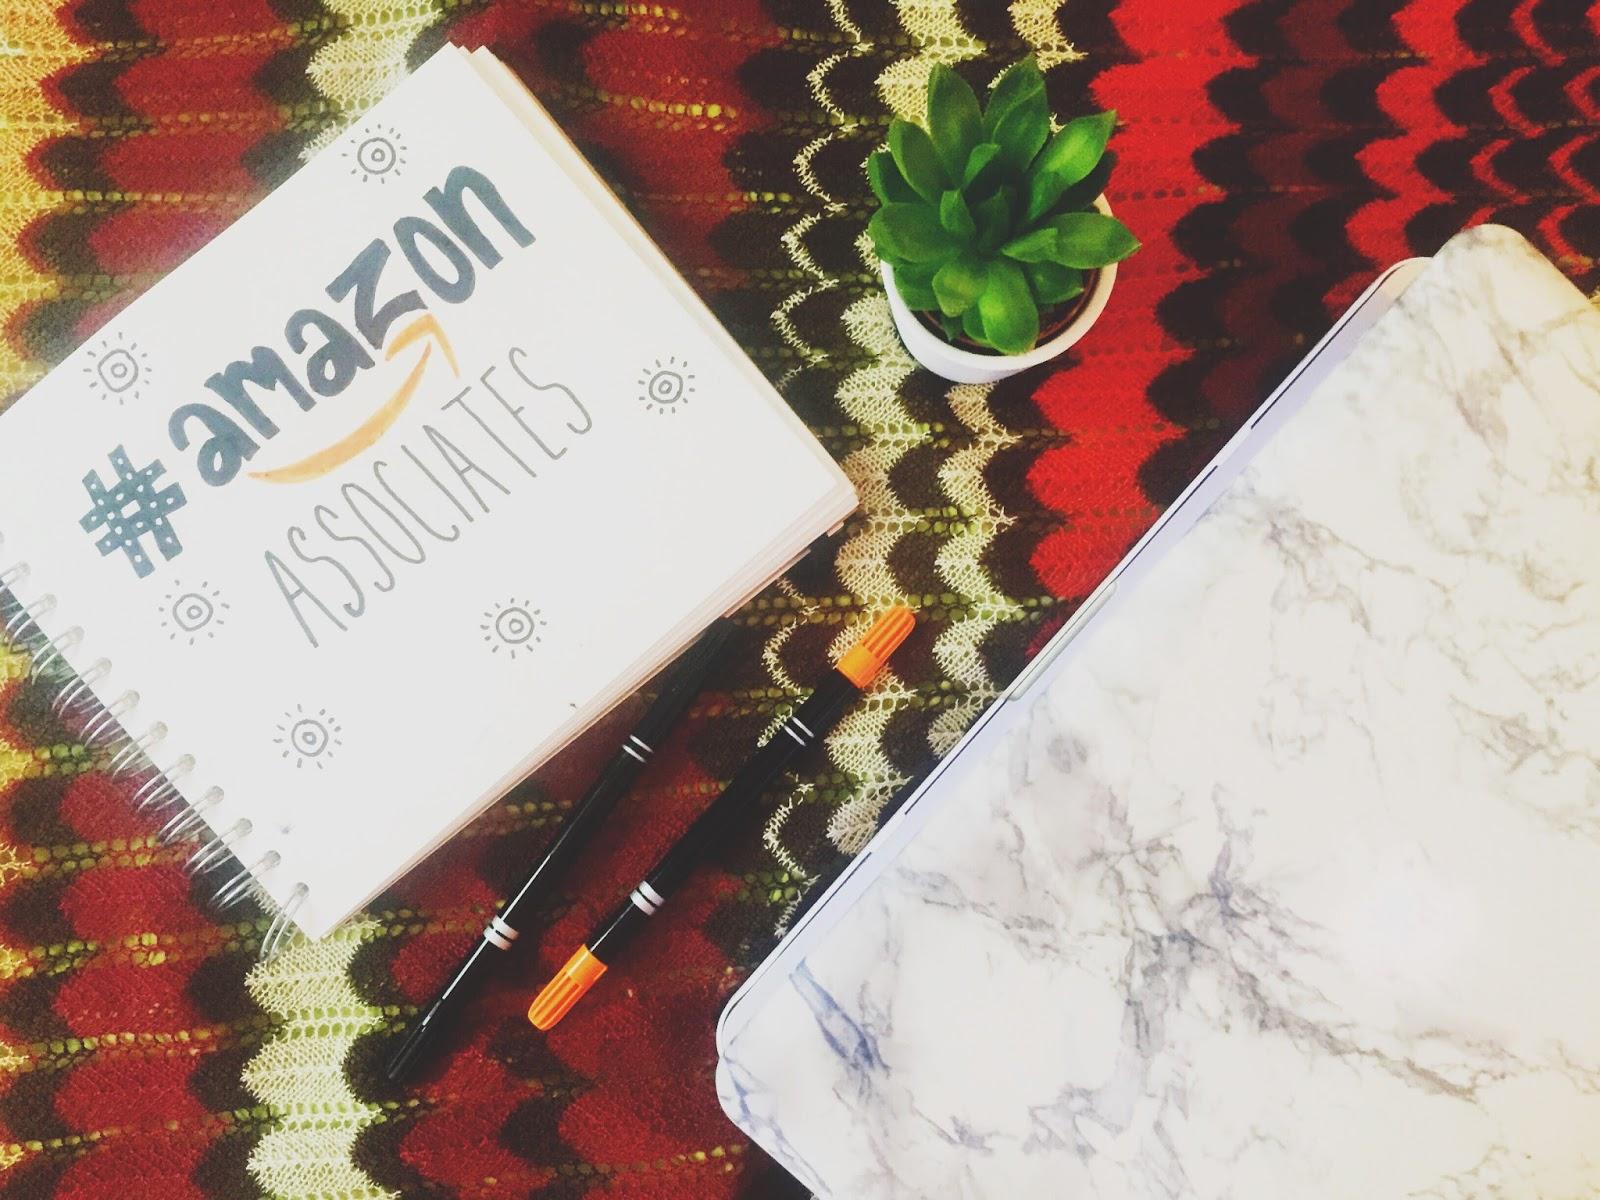 Amazon Associates evening